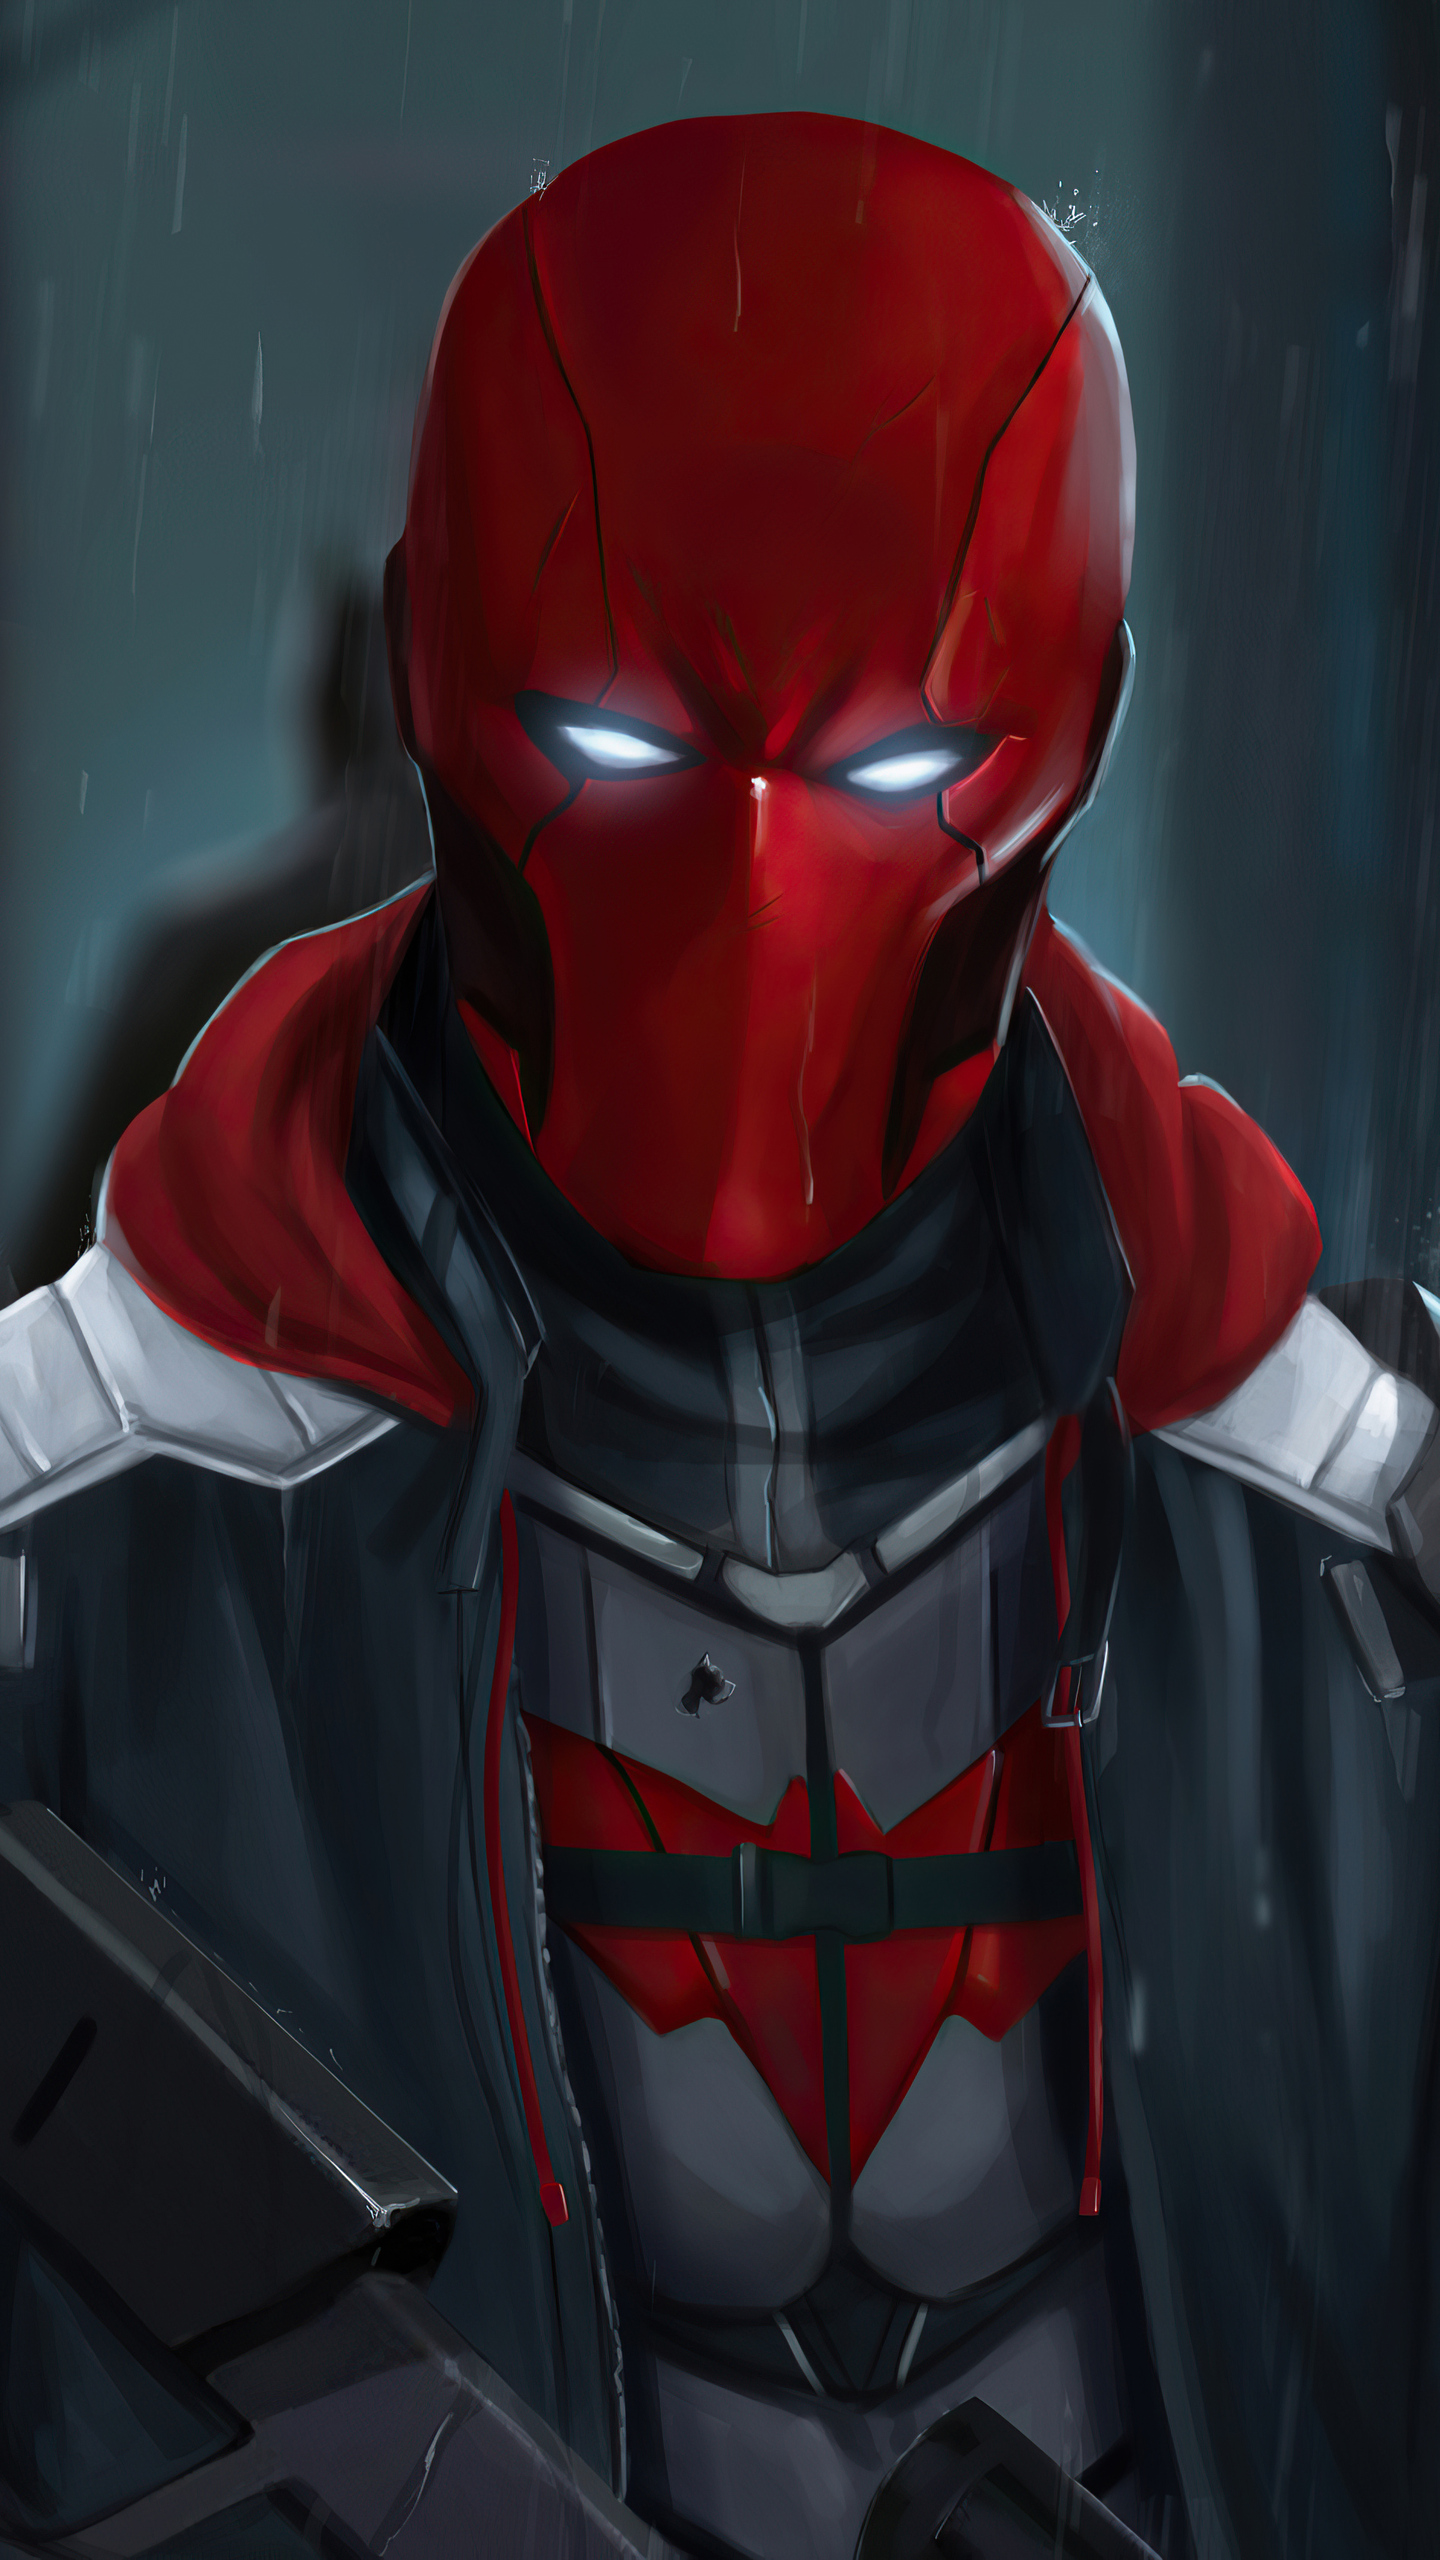 red-hood-mask-2020-4k-pc.jpg